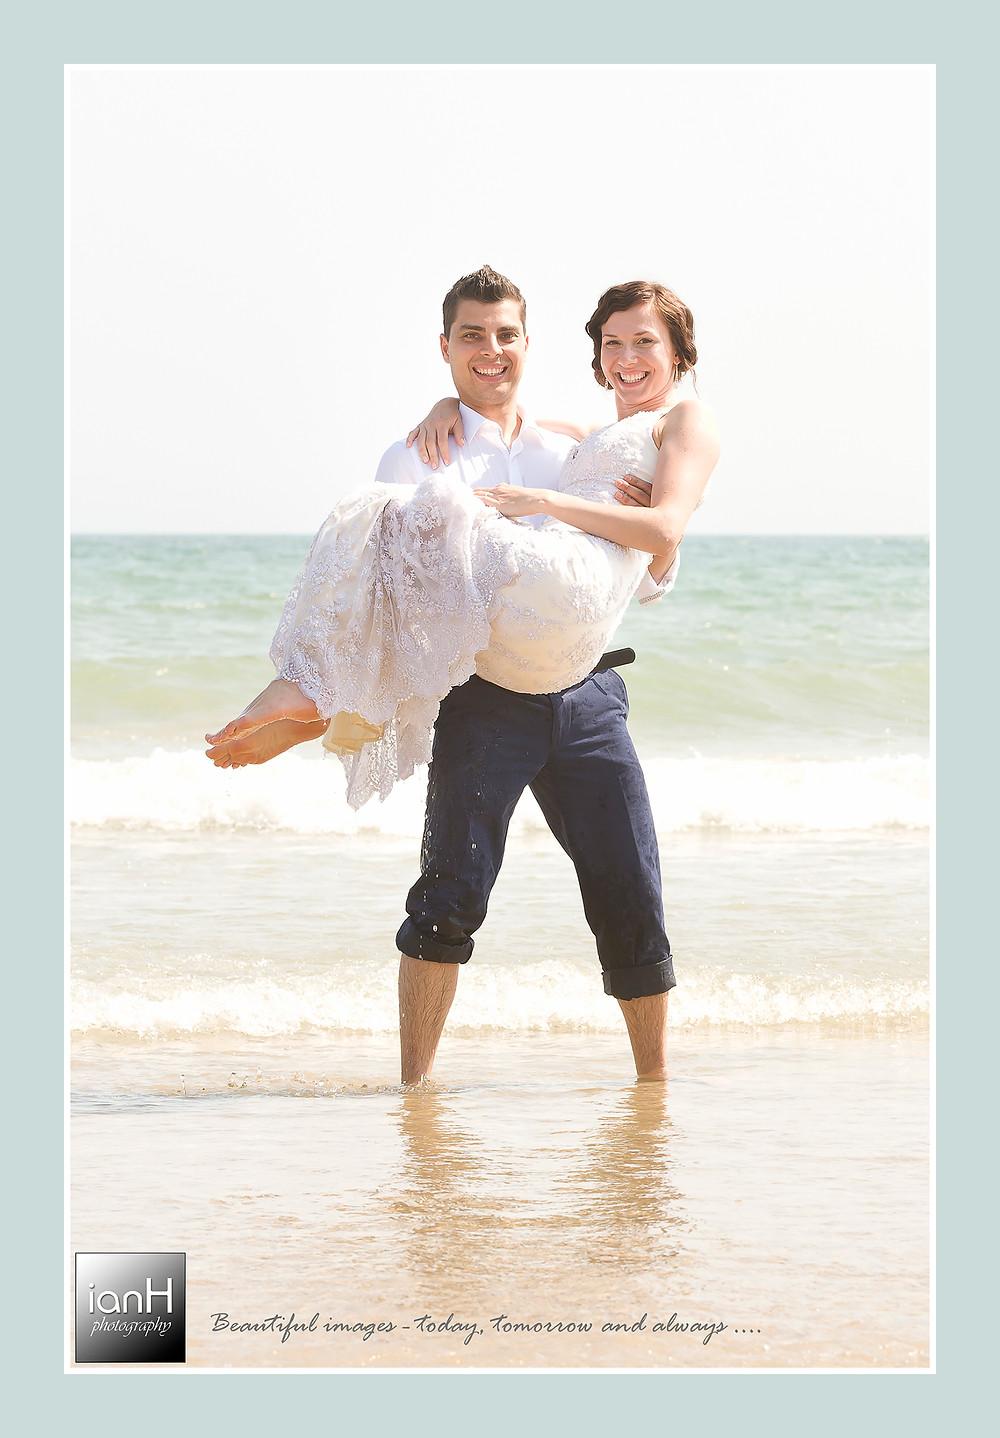 Beach Weddings Bournemouth anniversary - Anna and Daniel in the sea